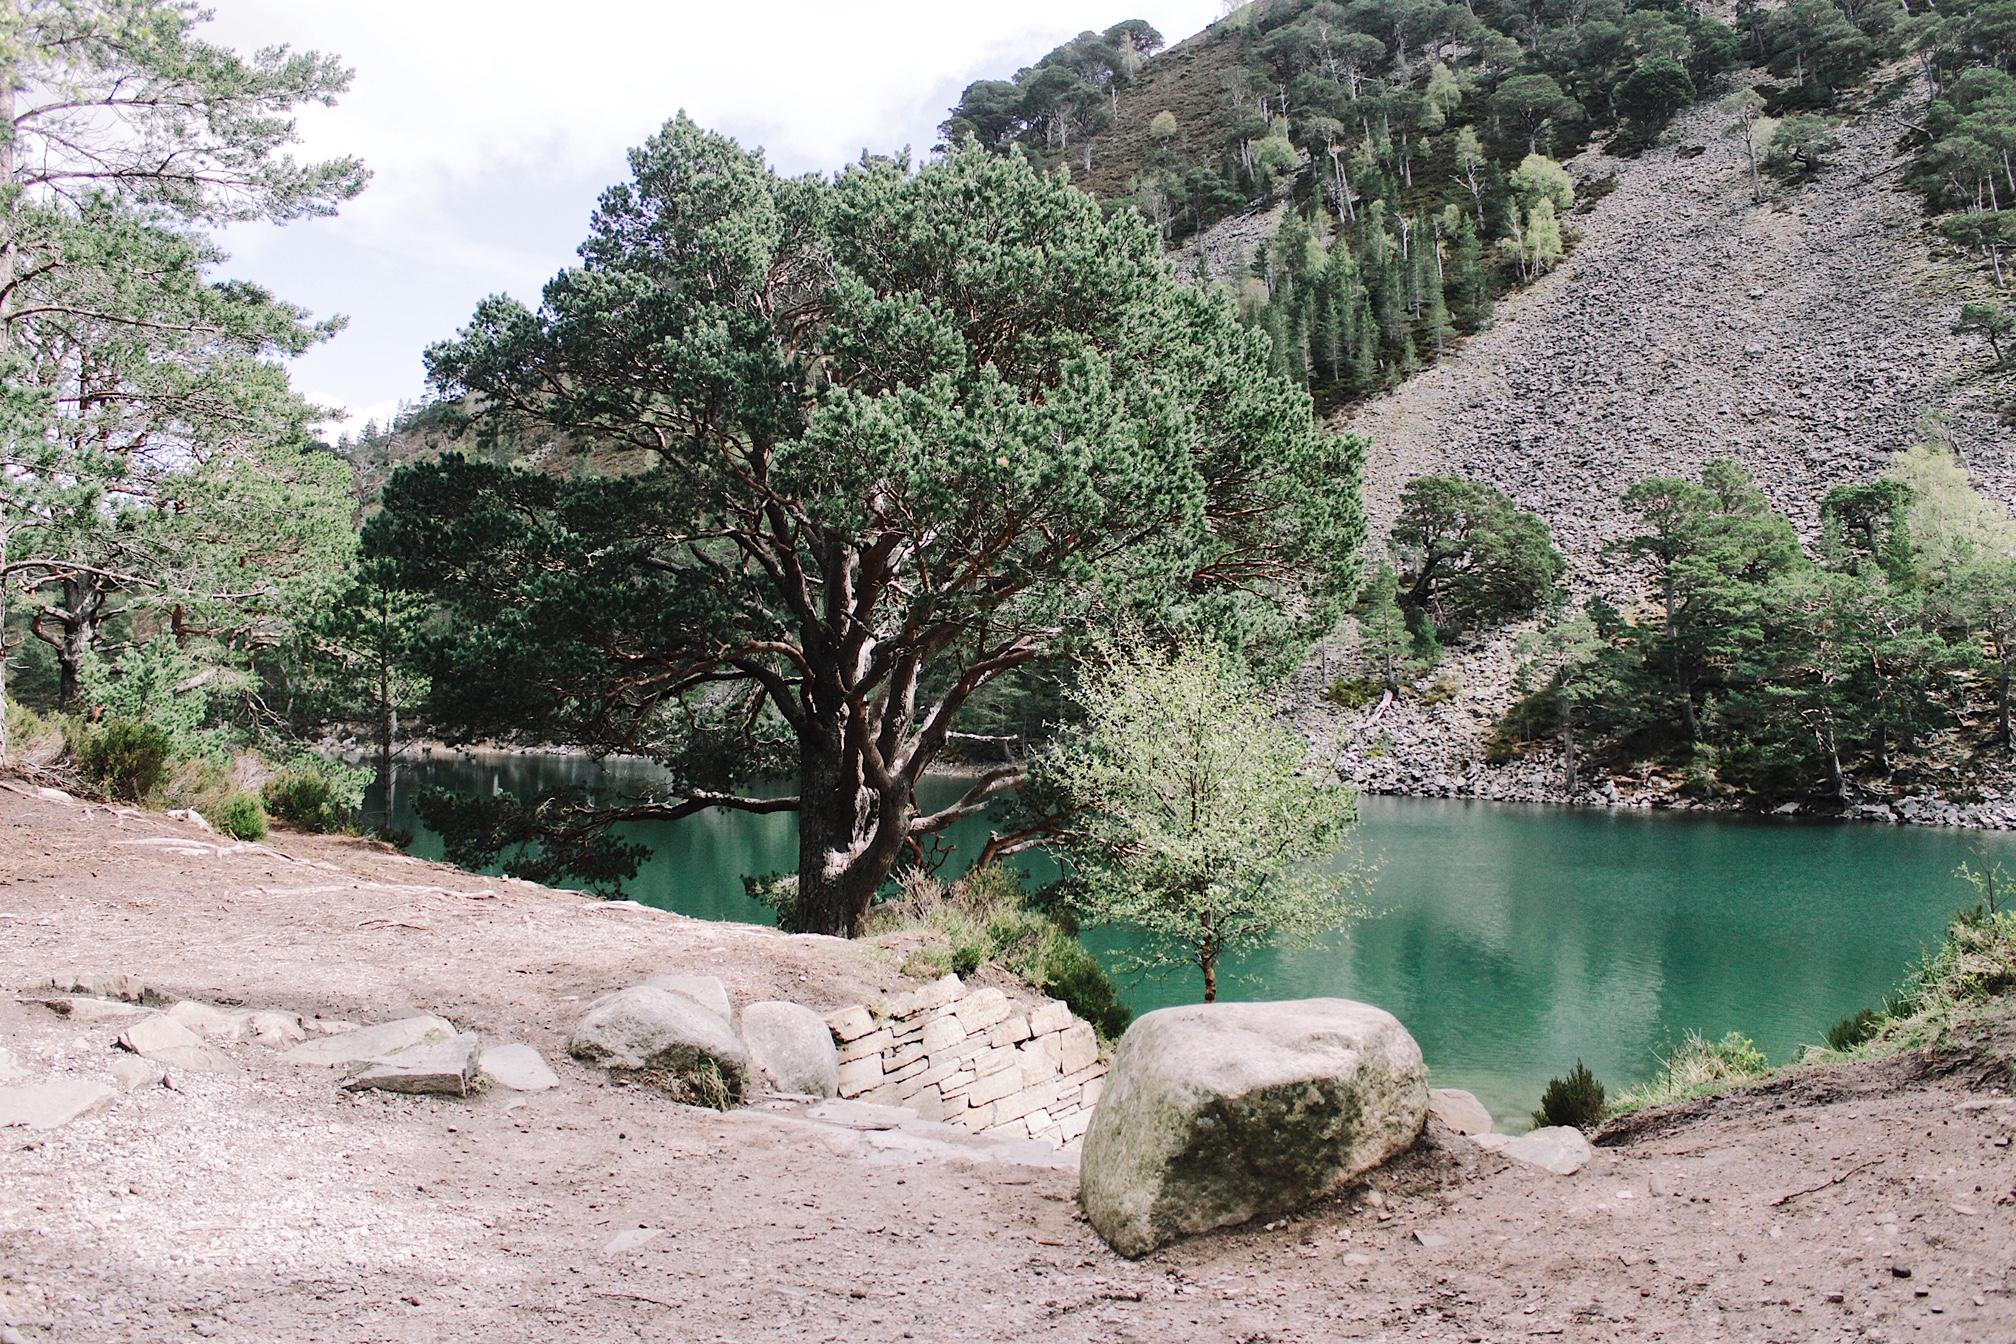 The Green Loch, Lochan Uaine, Aviemore